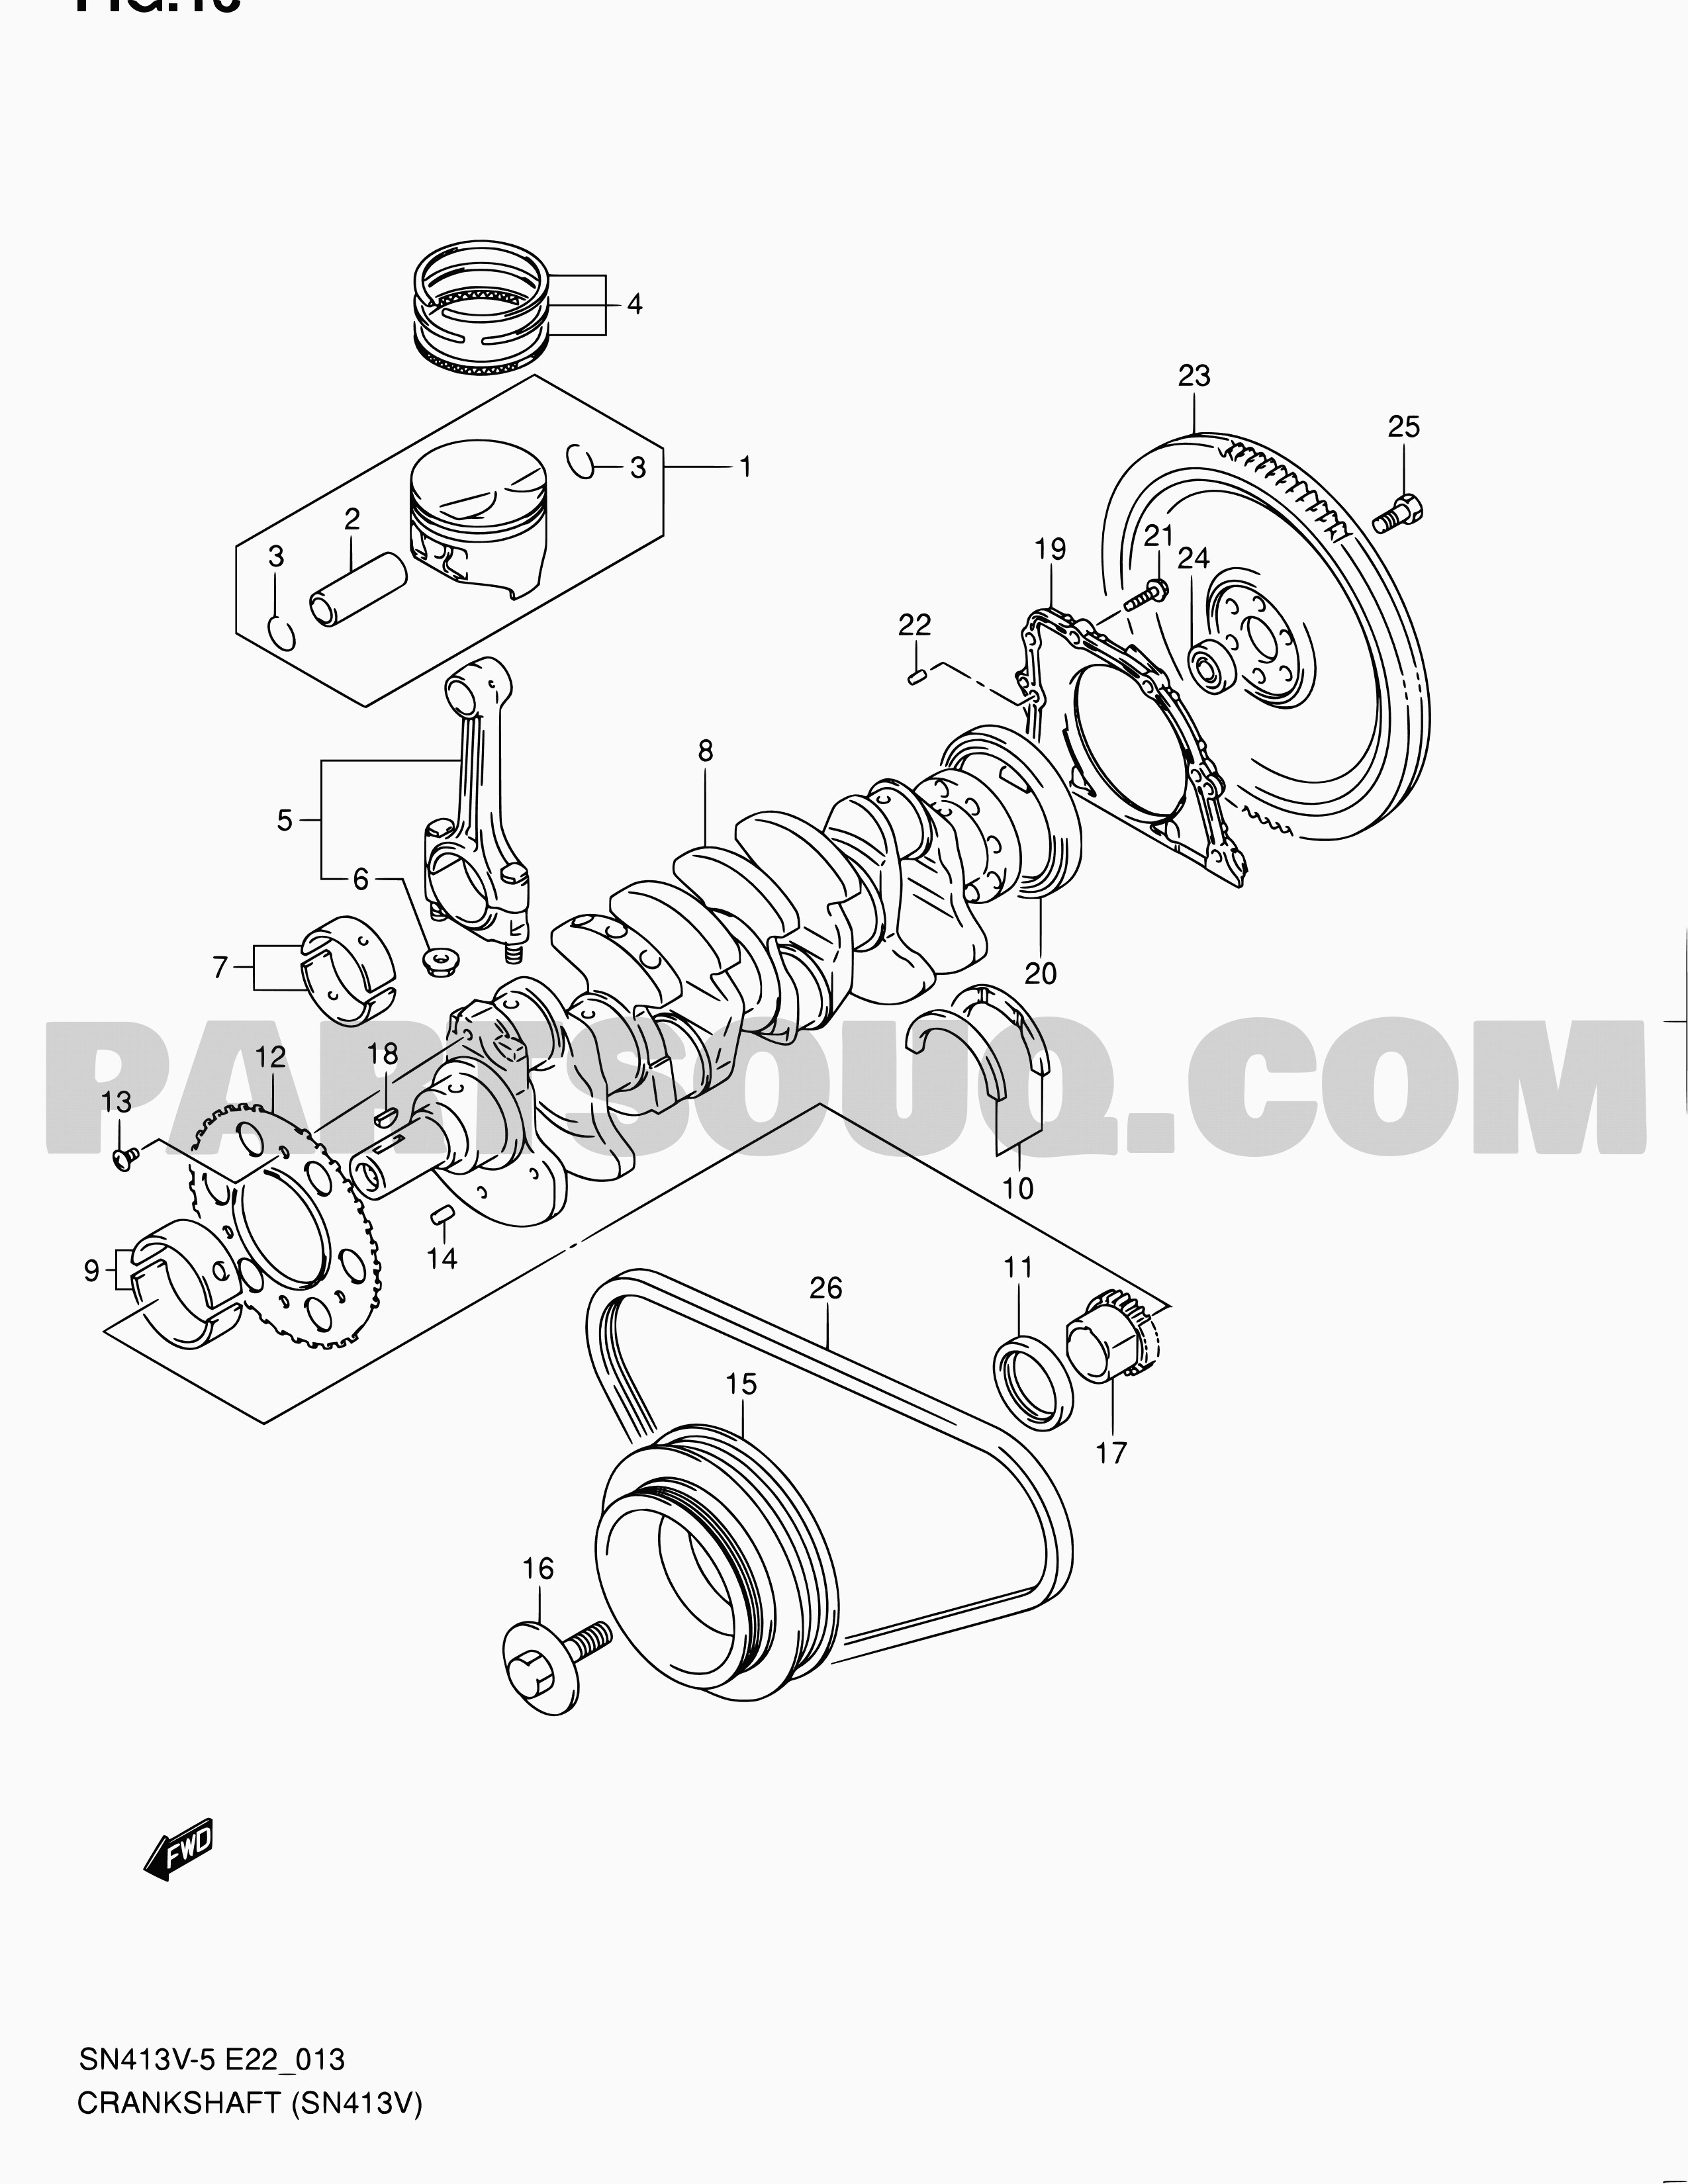 Suzuki M13a Engine Diagram Jimny Z2t M13a Jsafjb43v Suzuki Of Suzuki M13a Engine Diagram